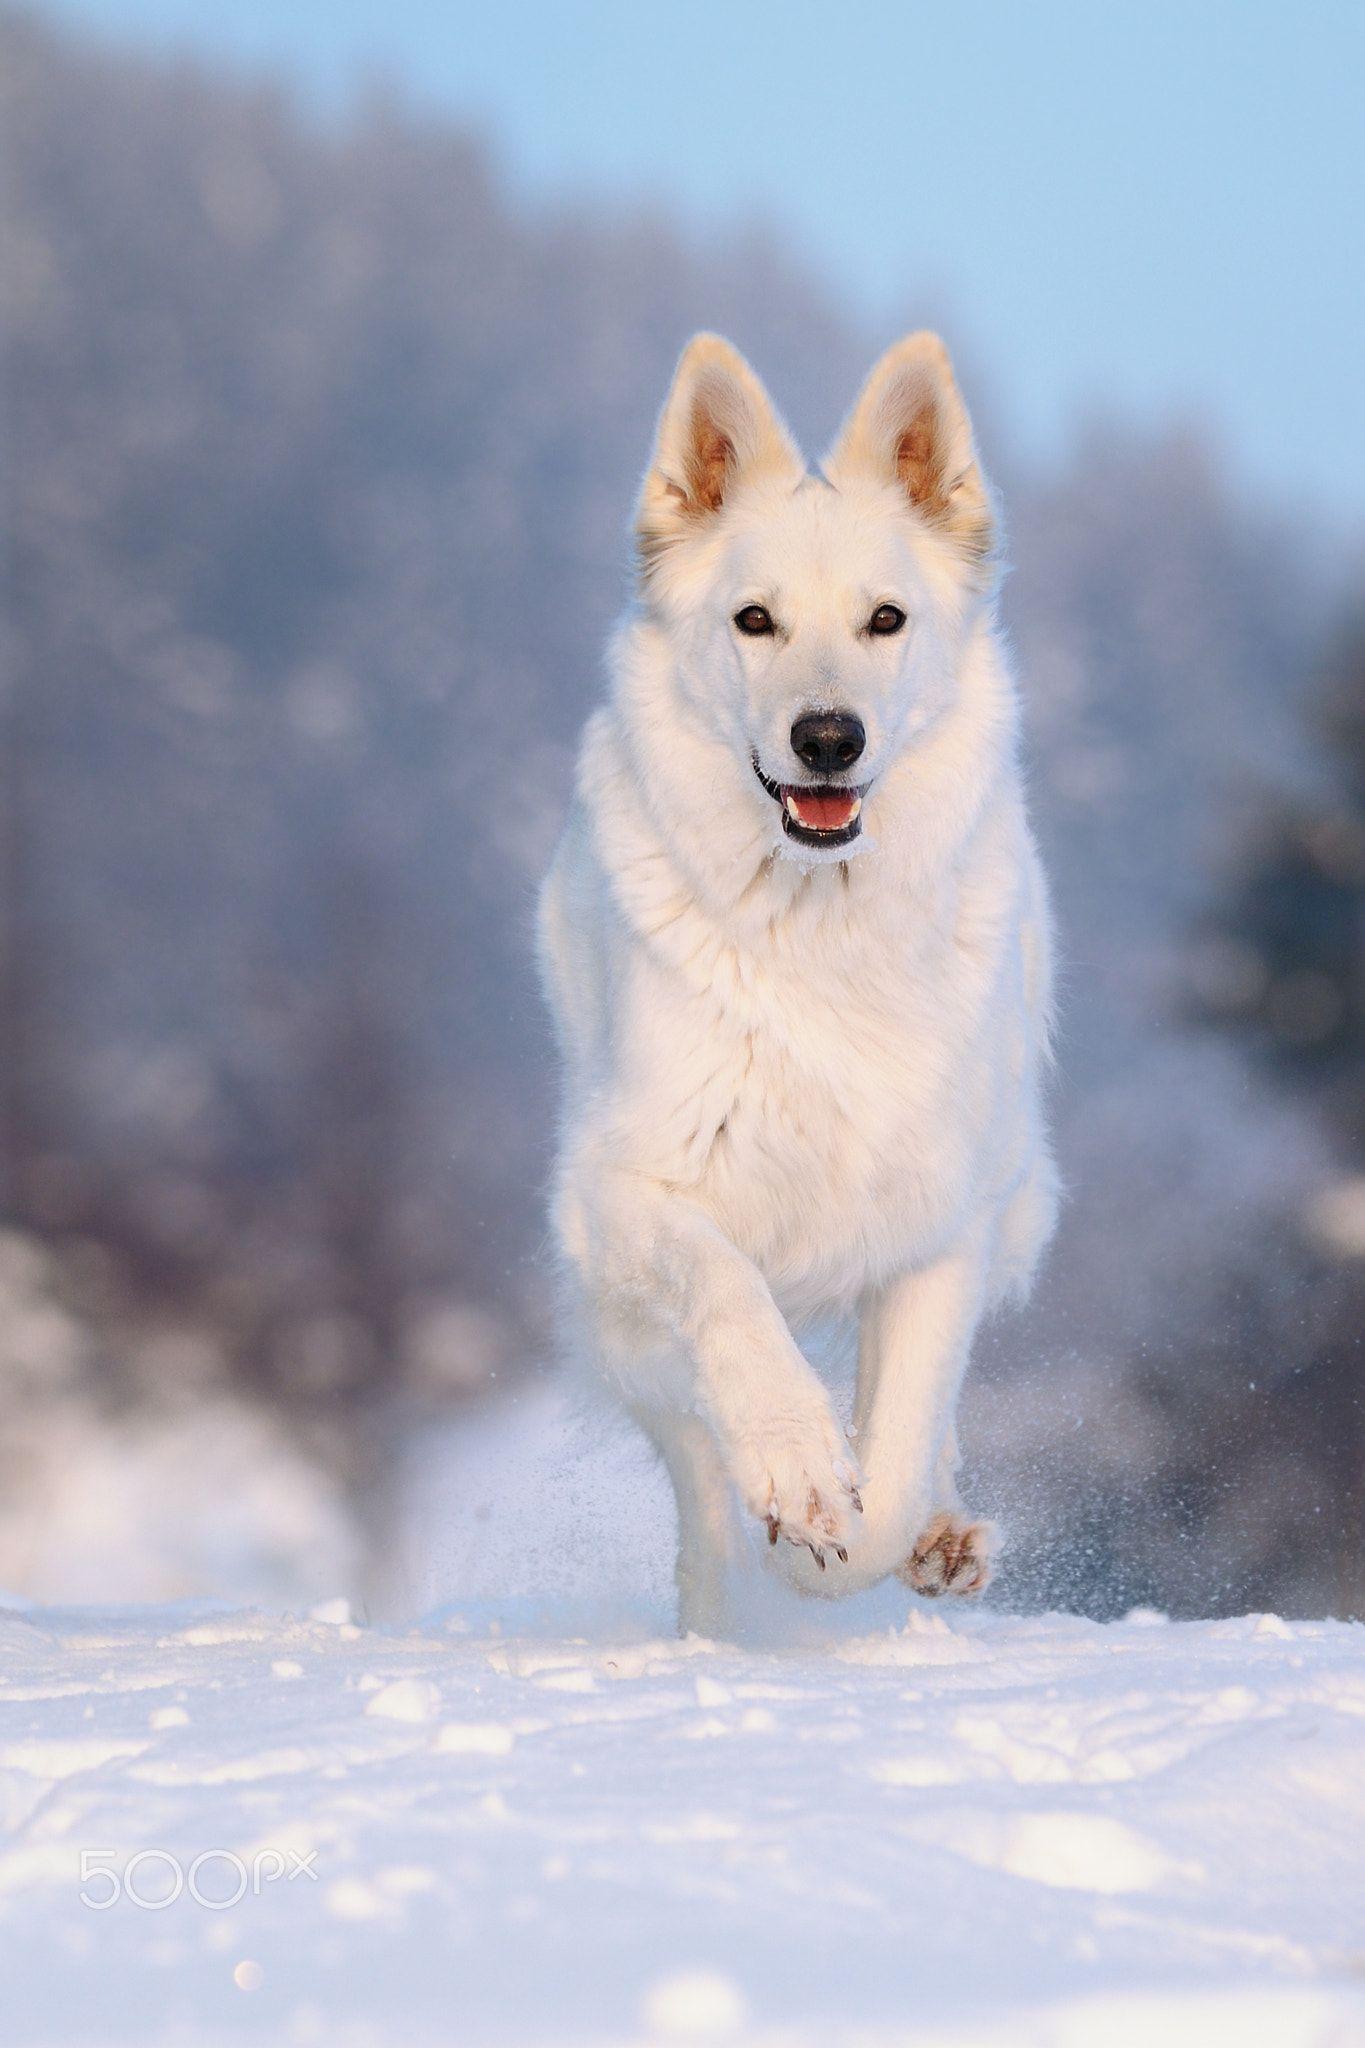 White Shepherd Running In The Evening White Shepherd Running In The Evening Weisser Schweizer Schaferhu White German Shepherd White Shepherd Beautiful Dogs